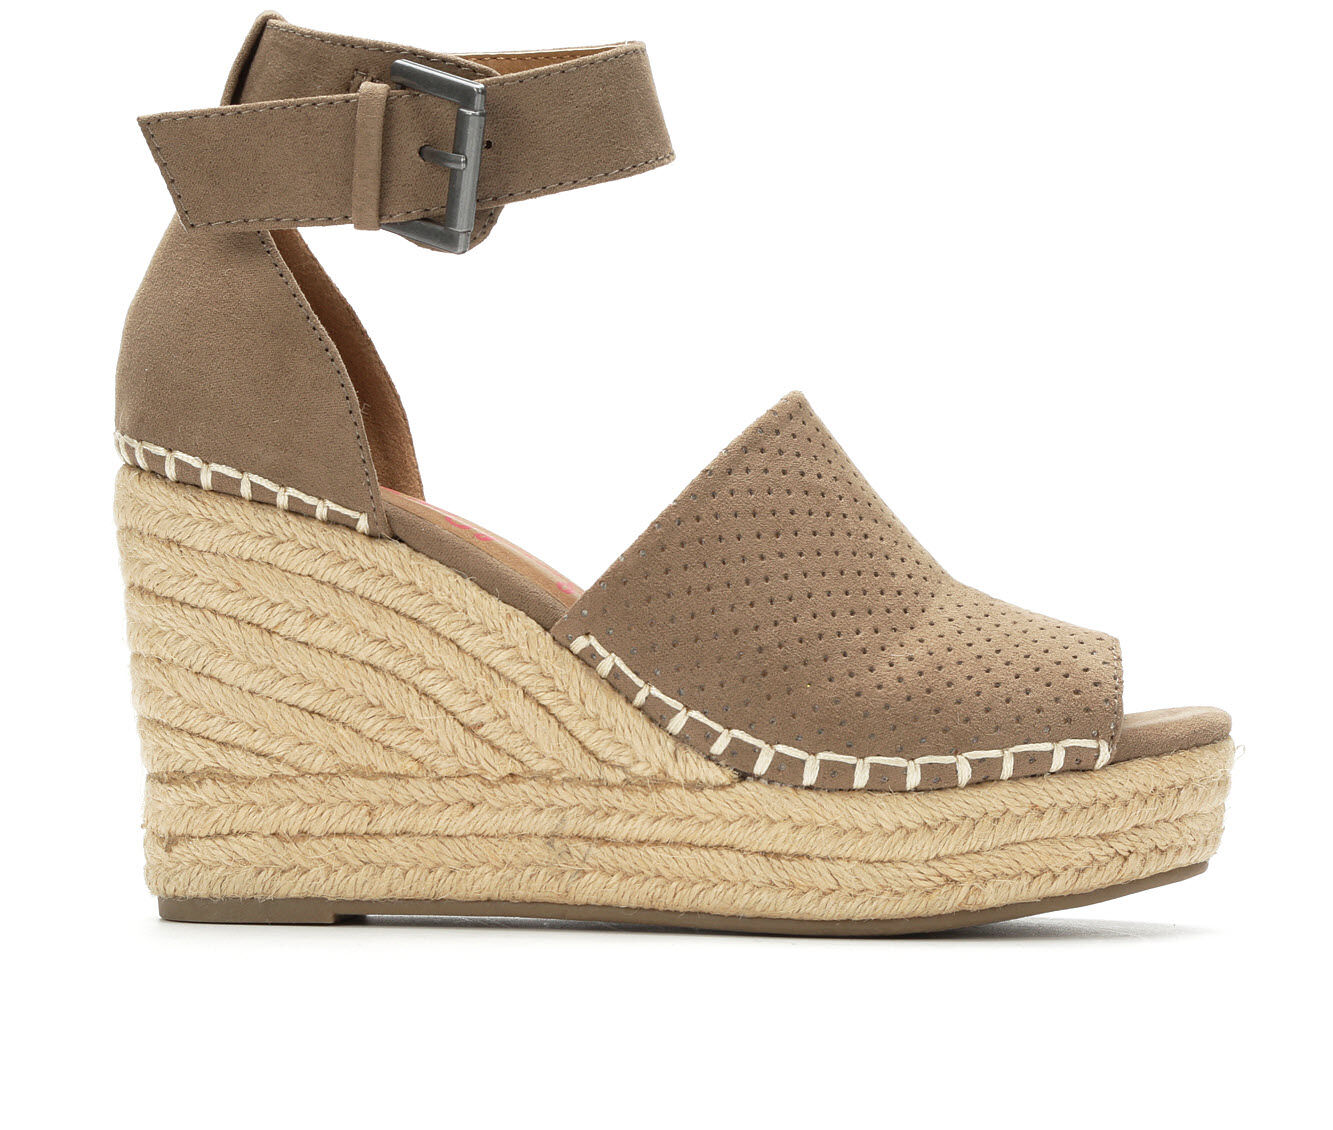 Women's Jellypop Alexia Platform Wedge Sandals manchester great sale cheap online 100% authentic sale online vr8MJJIL